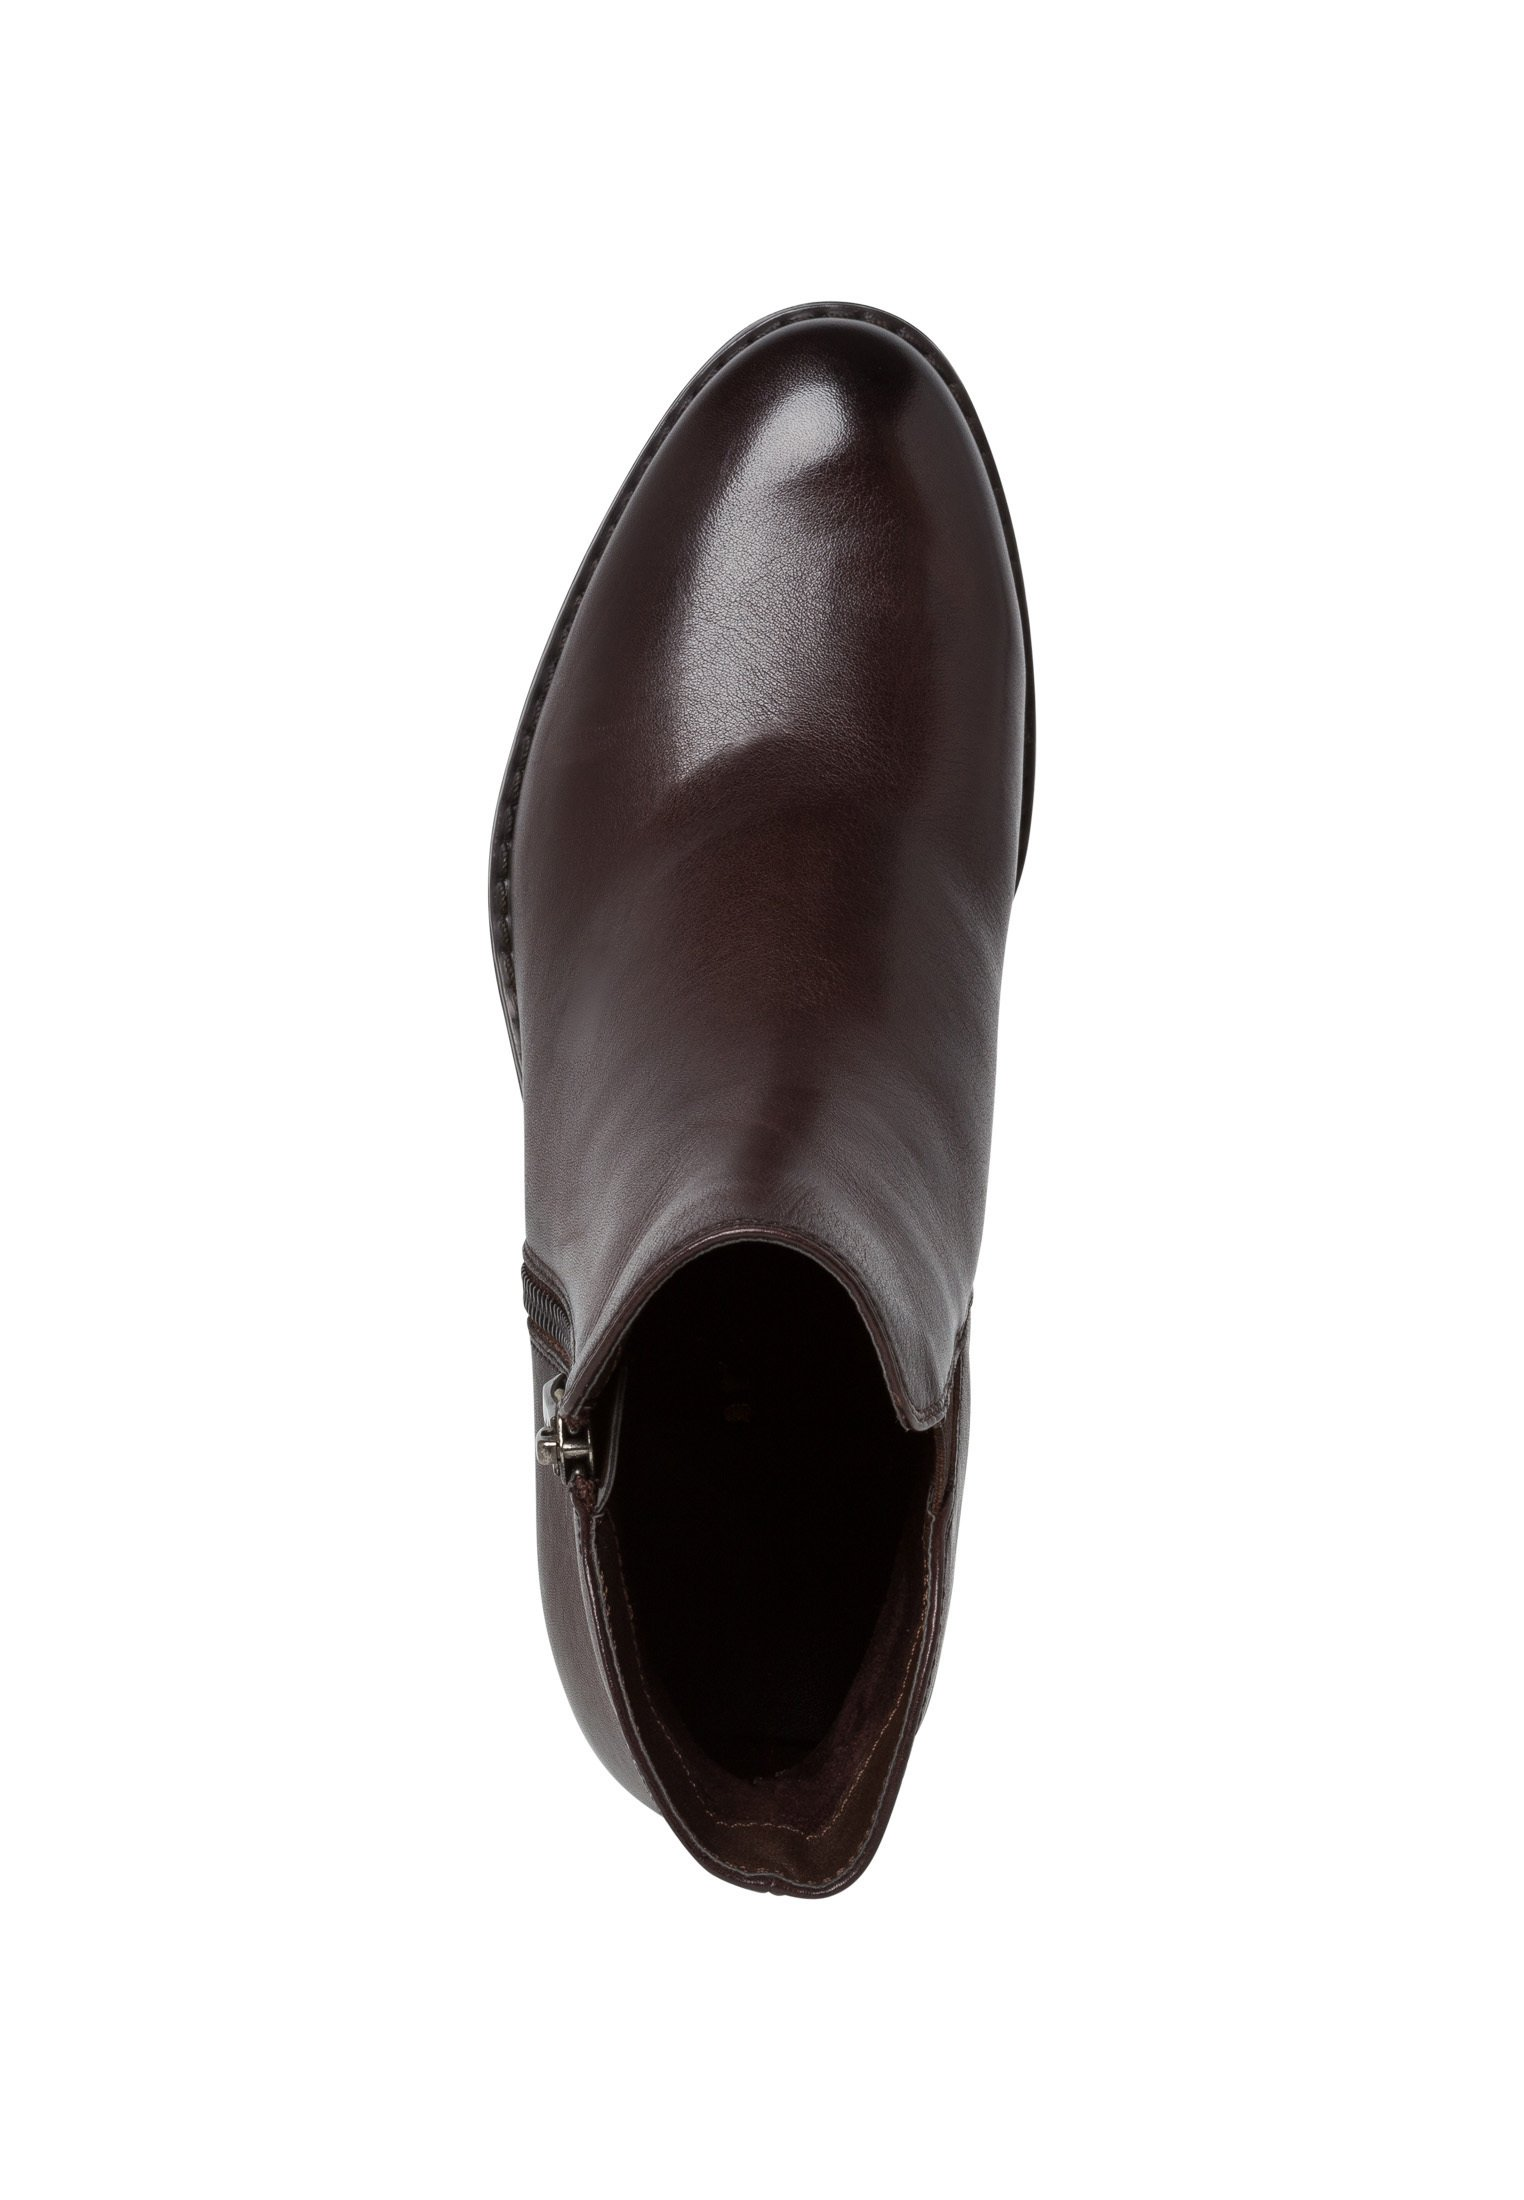 Tamaris Stiefelette - mocca | Damen Schuhe 2020